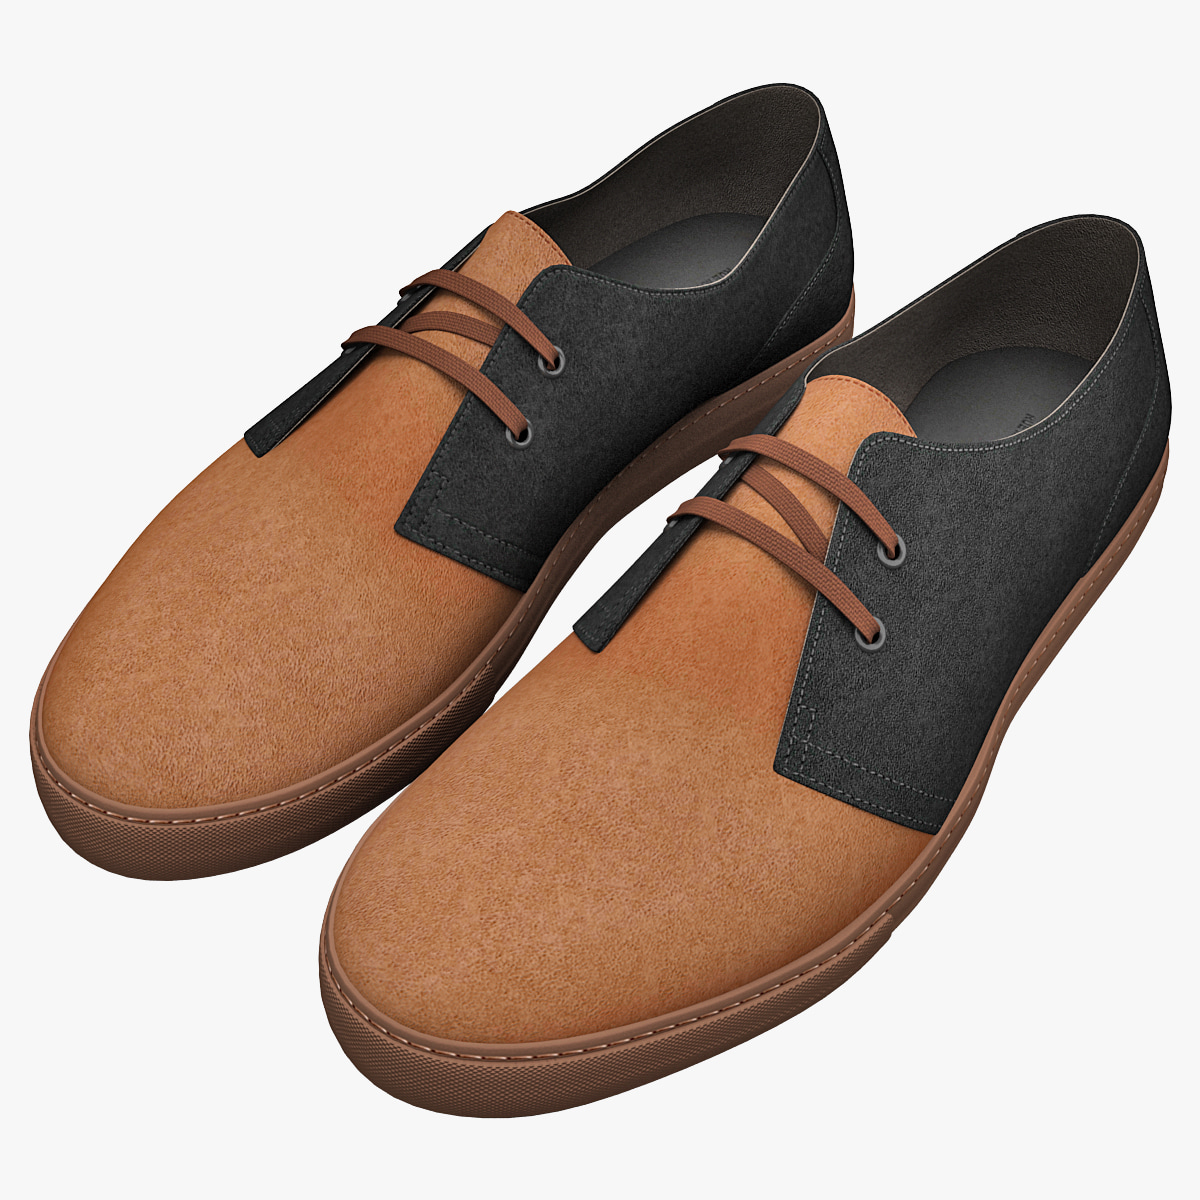 Men_Shoes_APC_V2_0002.jpg